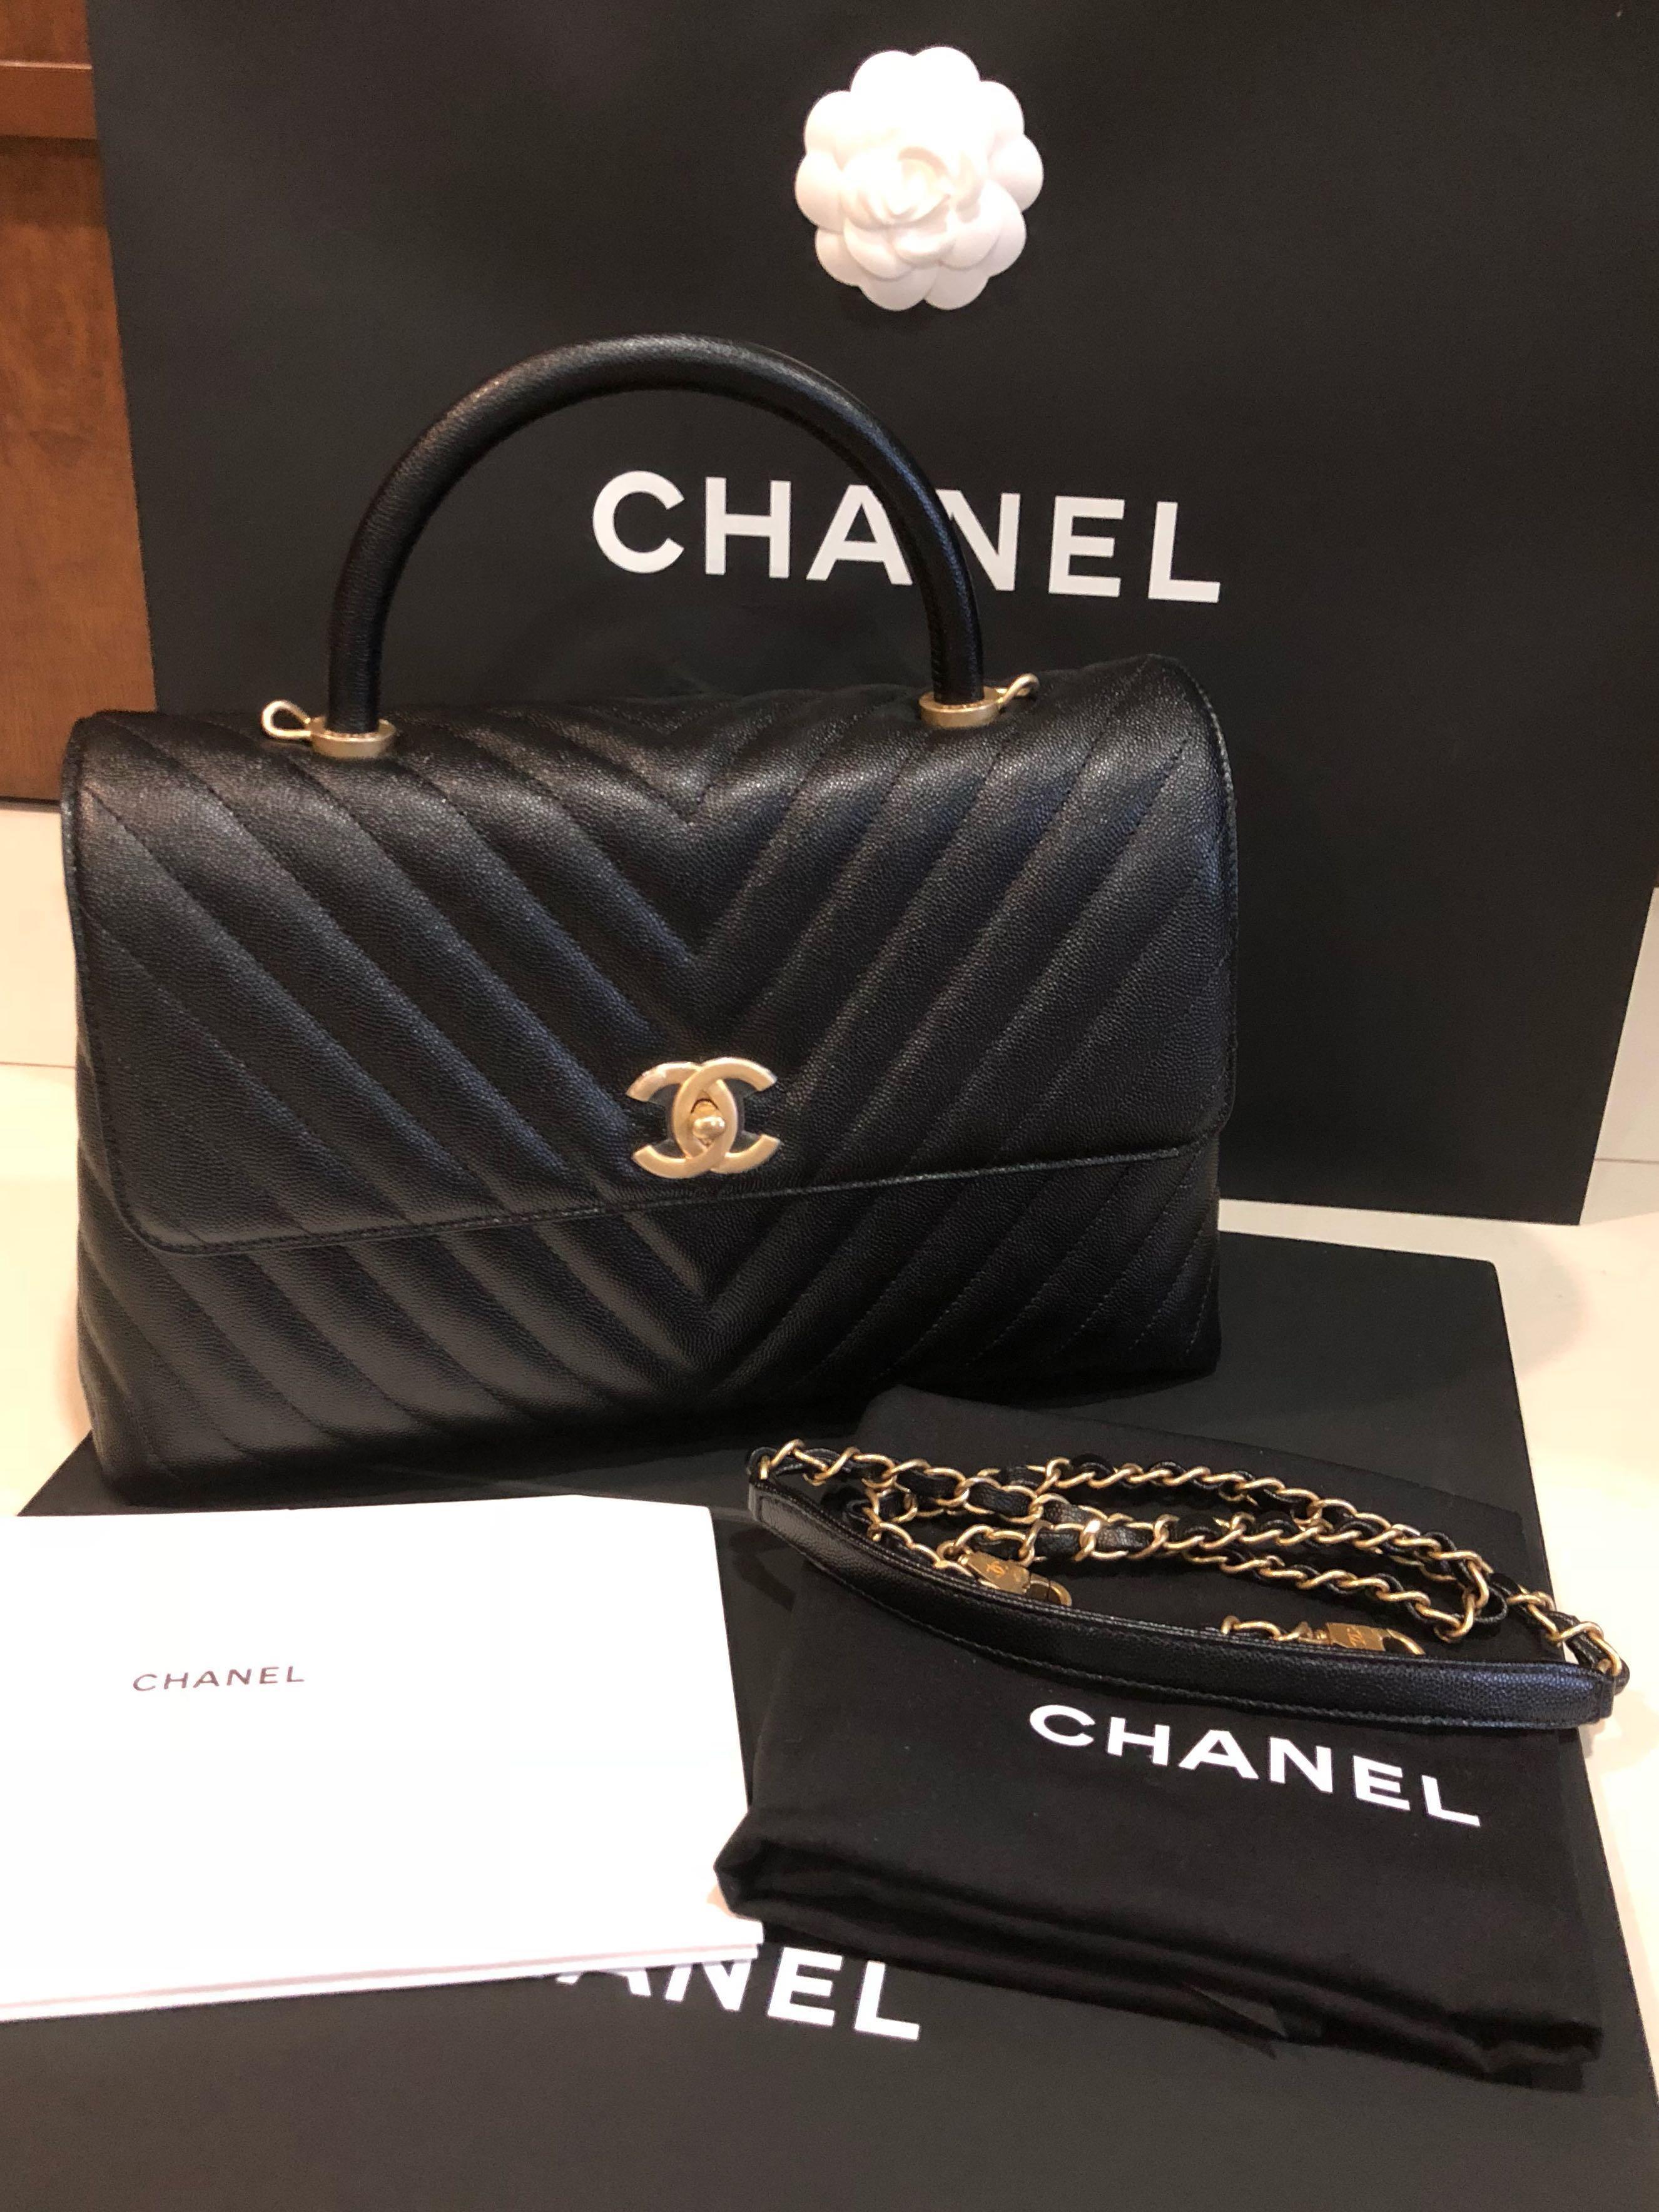 6f31f31e66baac Chanel Coco Handle Large, Luxury, Bags & Wallets, Handbags on Carousell